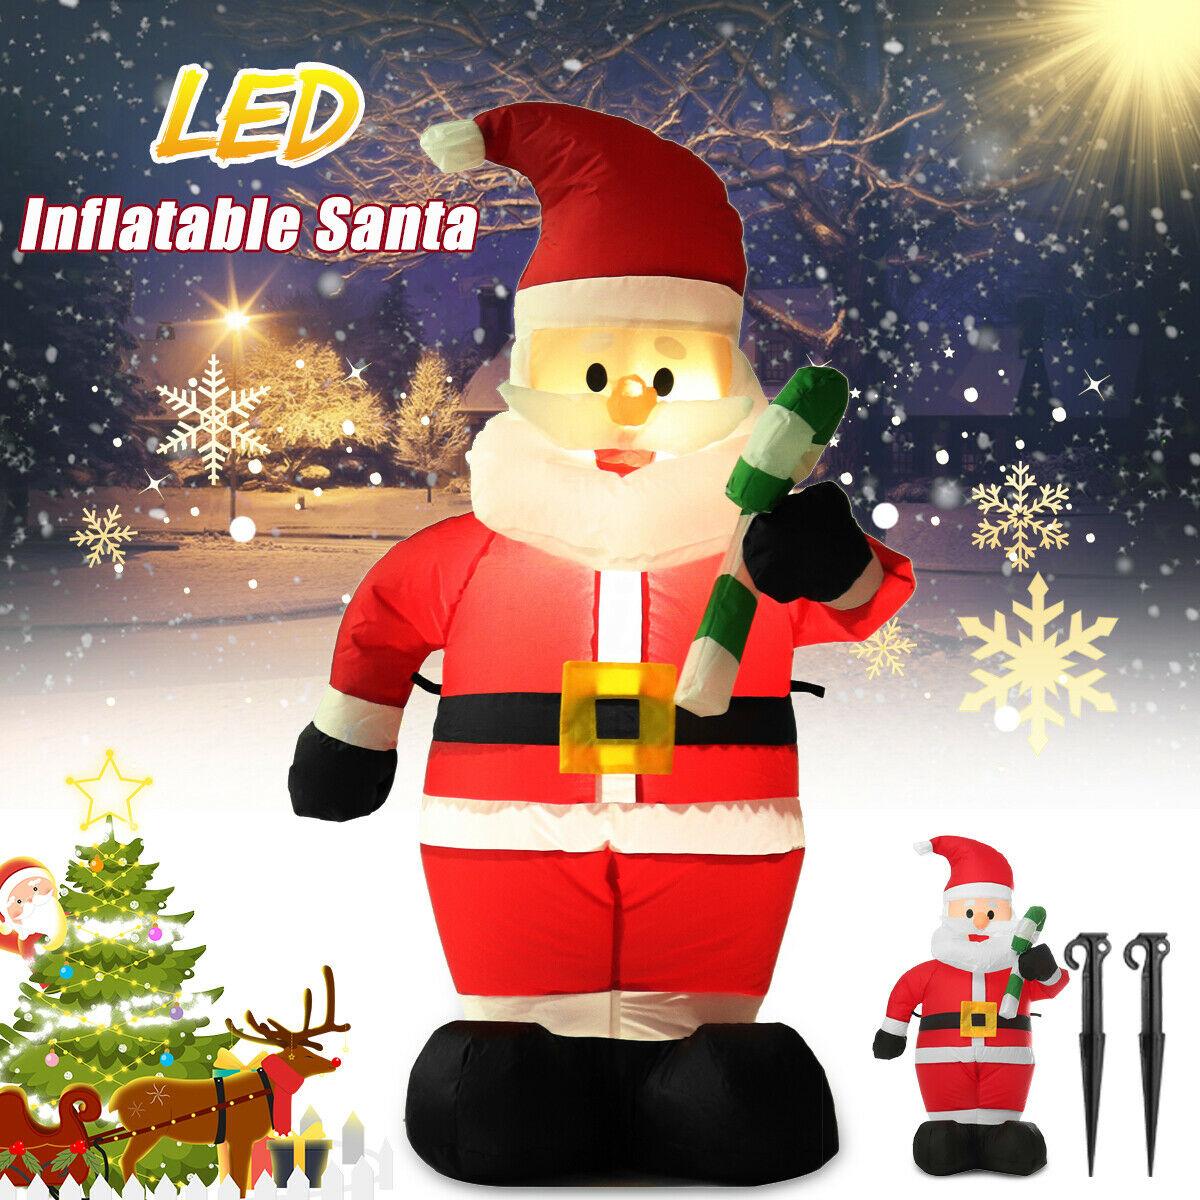 CHRISTMAS XMAS SANTA INFLATABLE BLOW UP DECORATIONS OUTDOOR